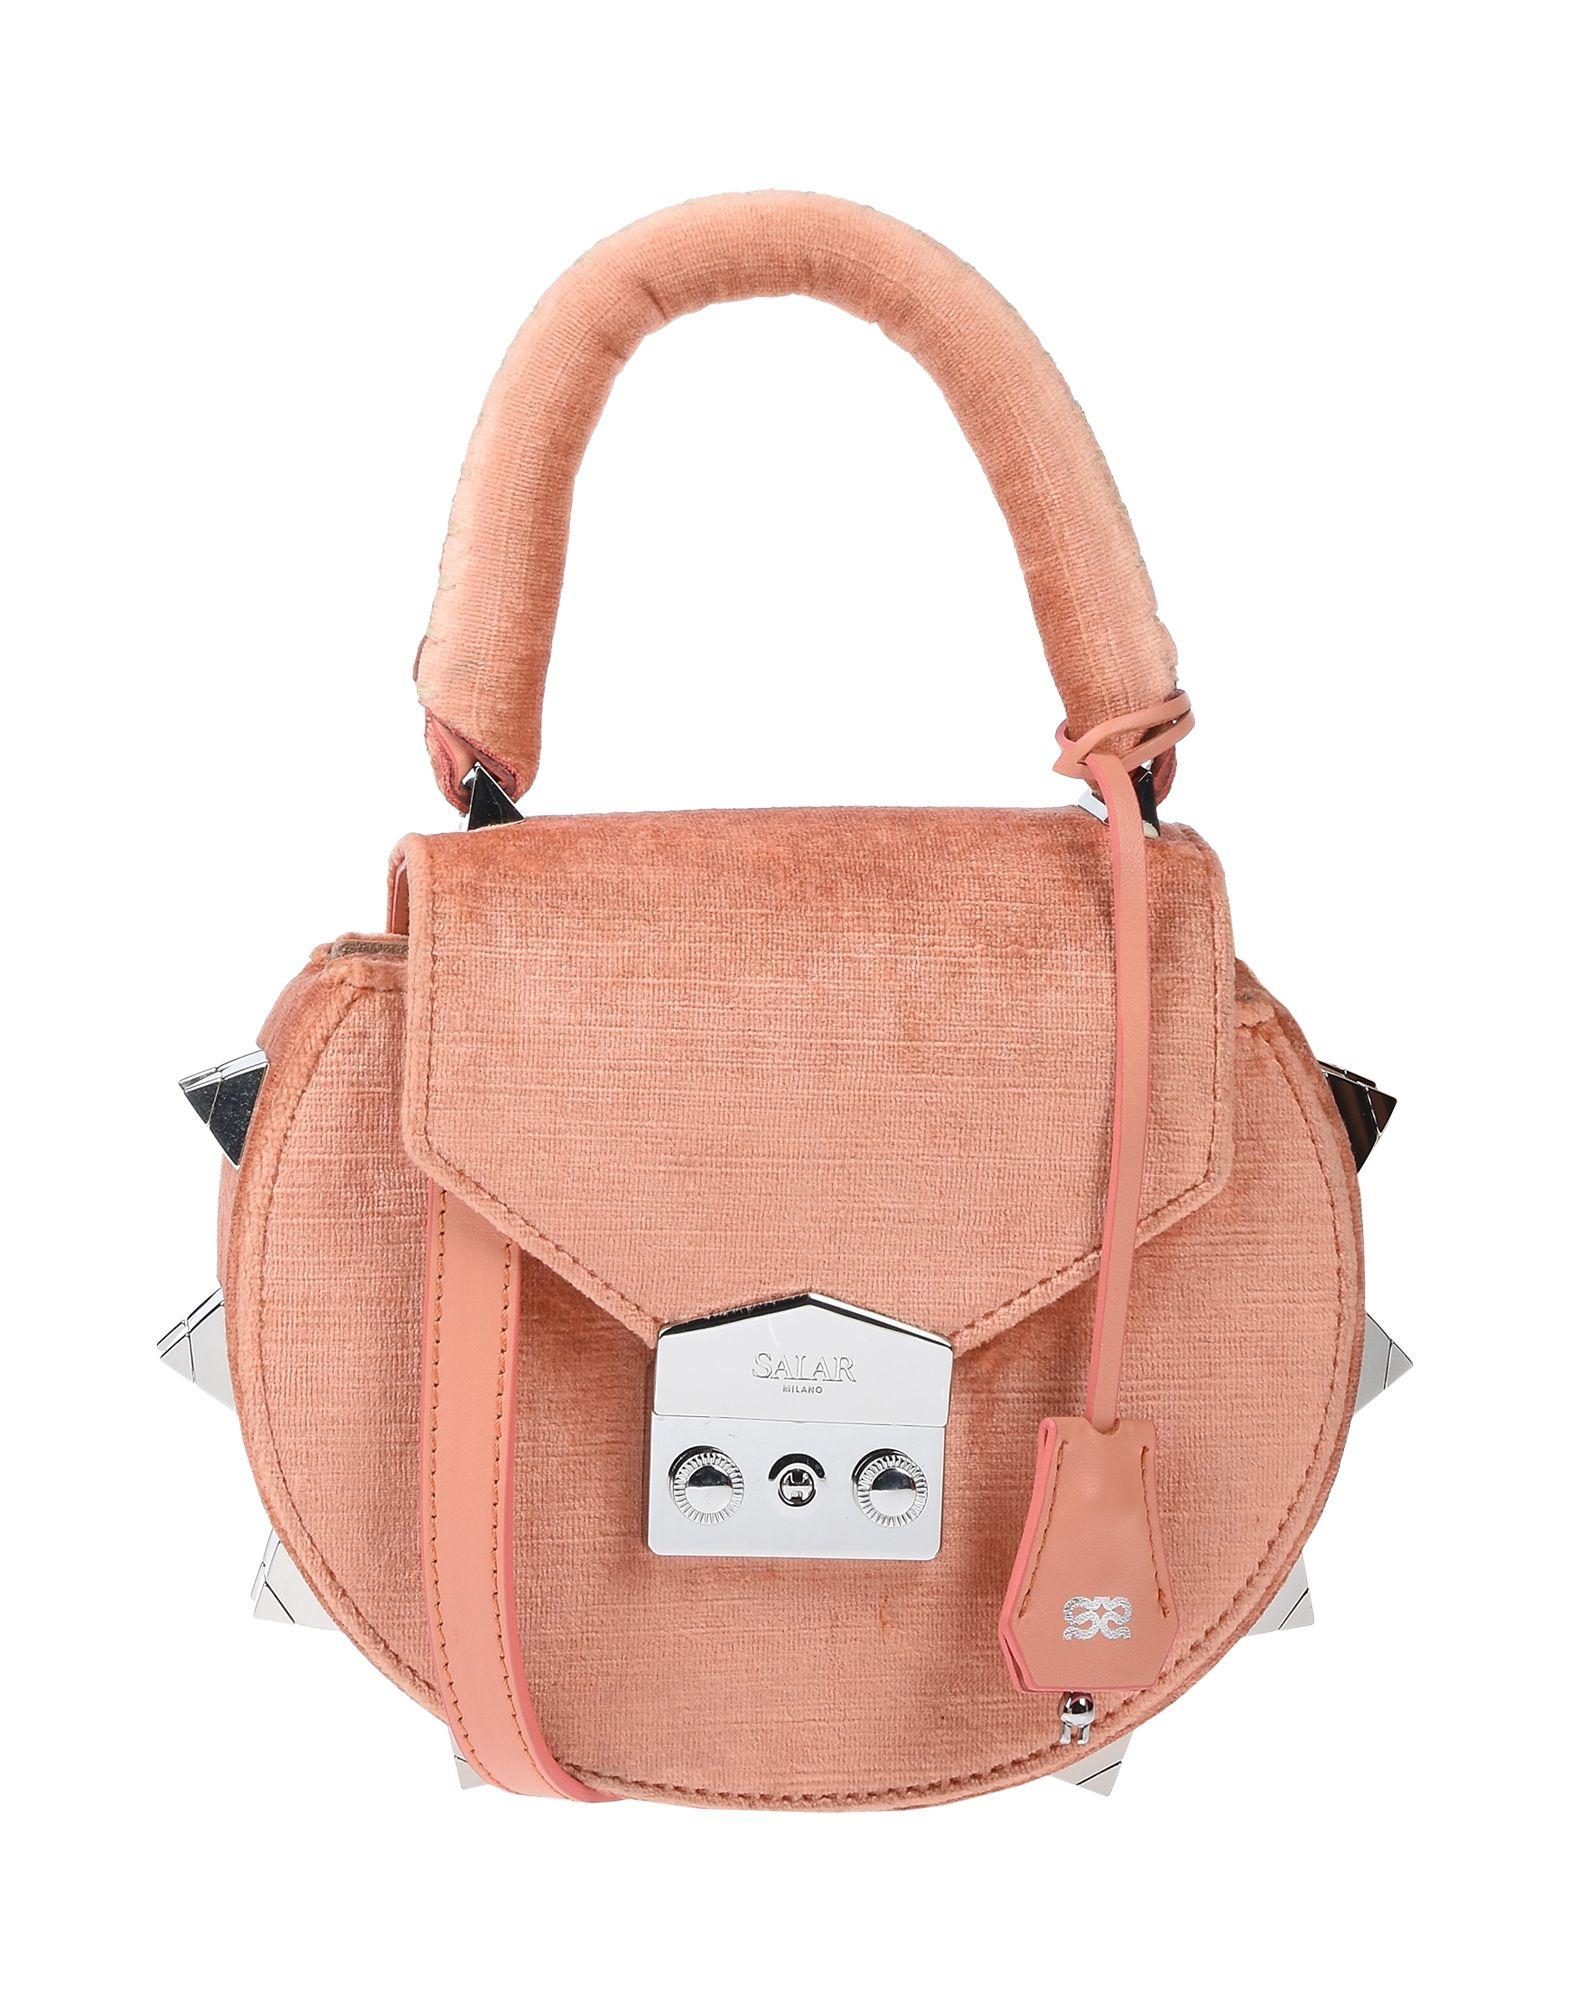 SALAR Сумка через плечо сумка через плечо anais gvani croco ag 1471 350161